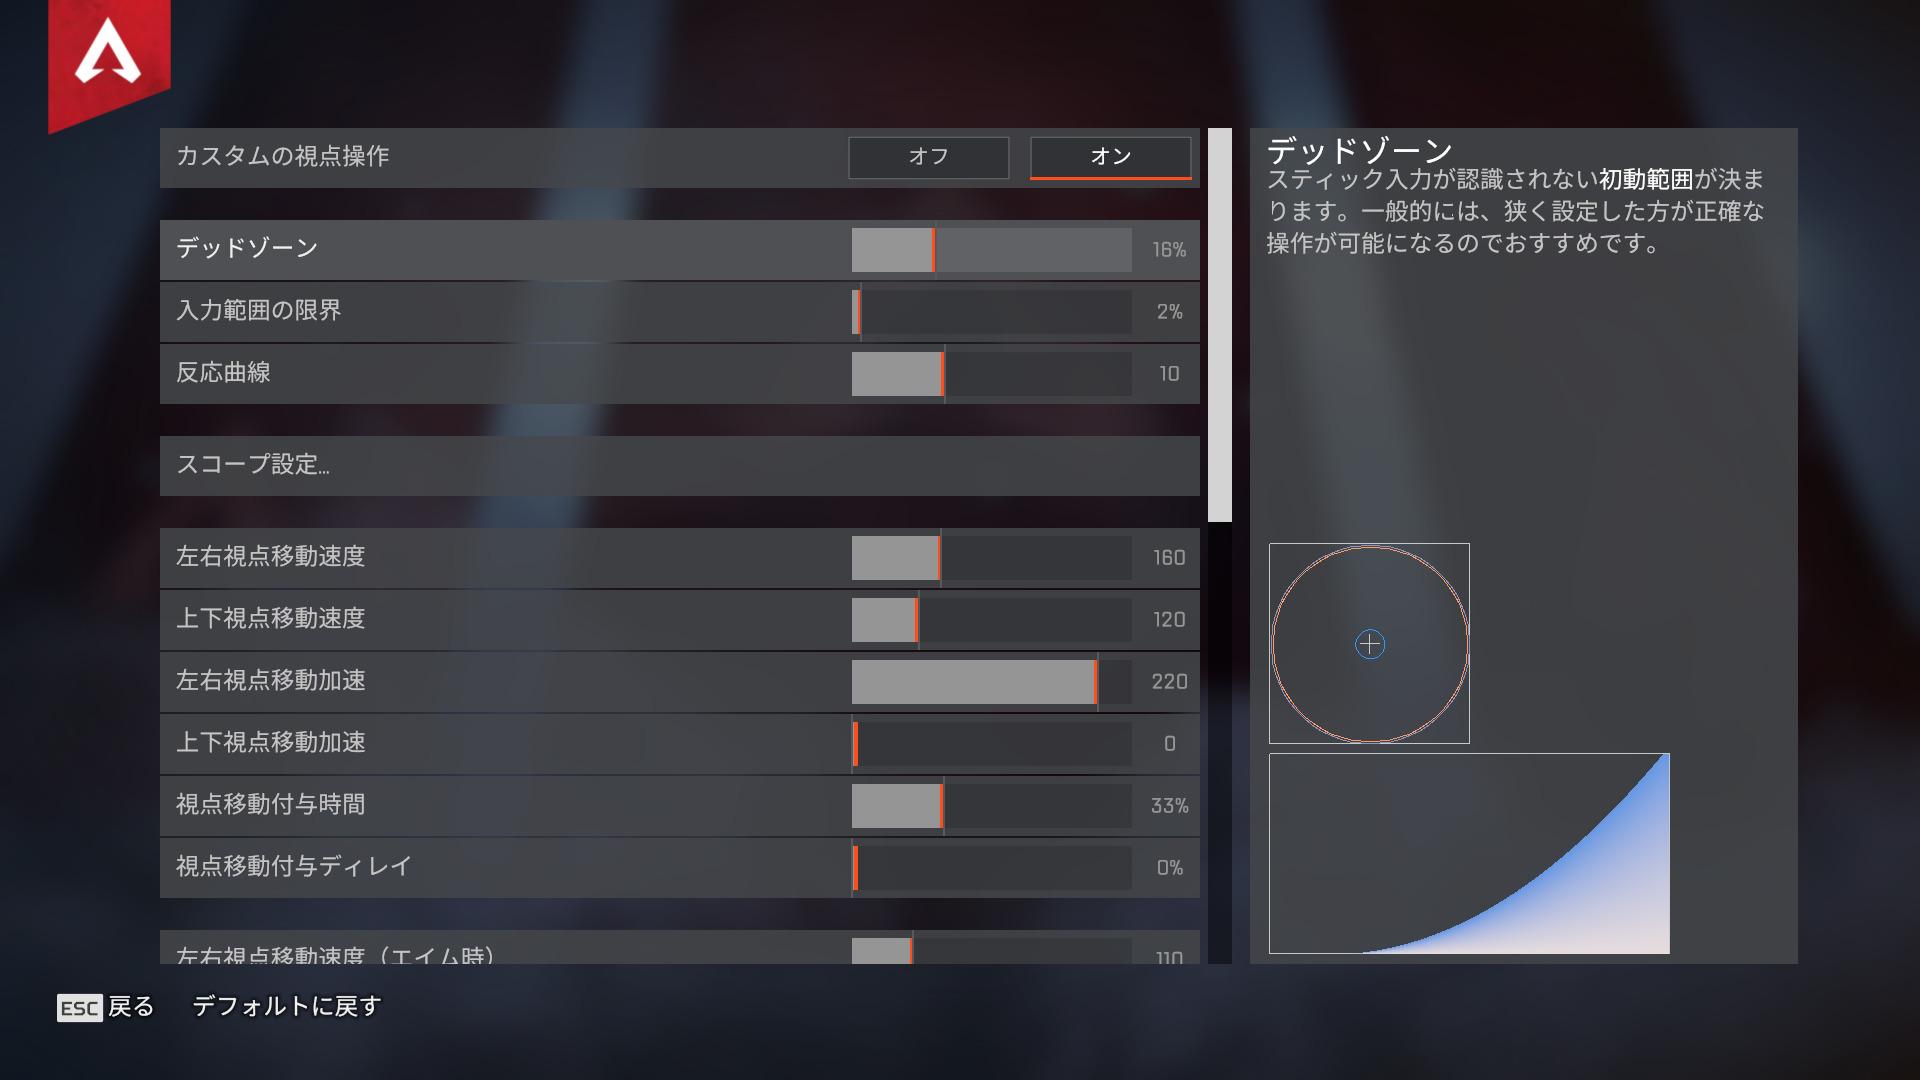 【APEX】消えた「詳細な視点操作」設定画面への行き方